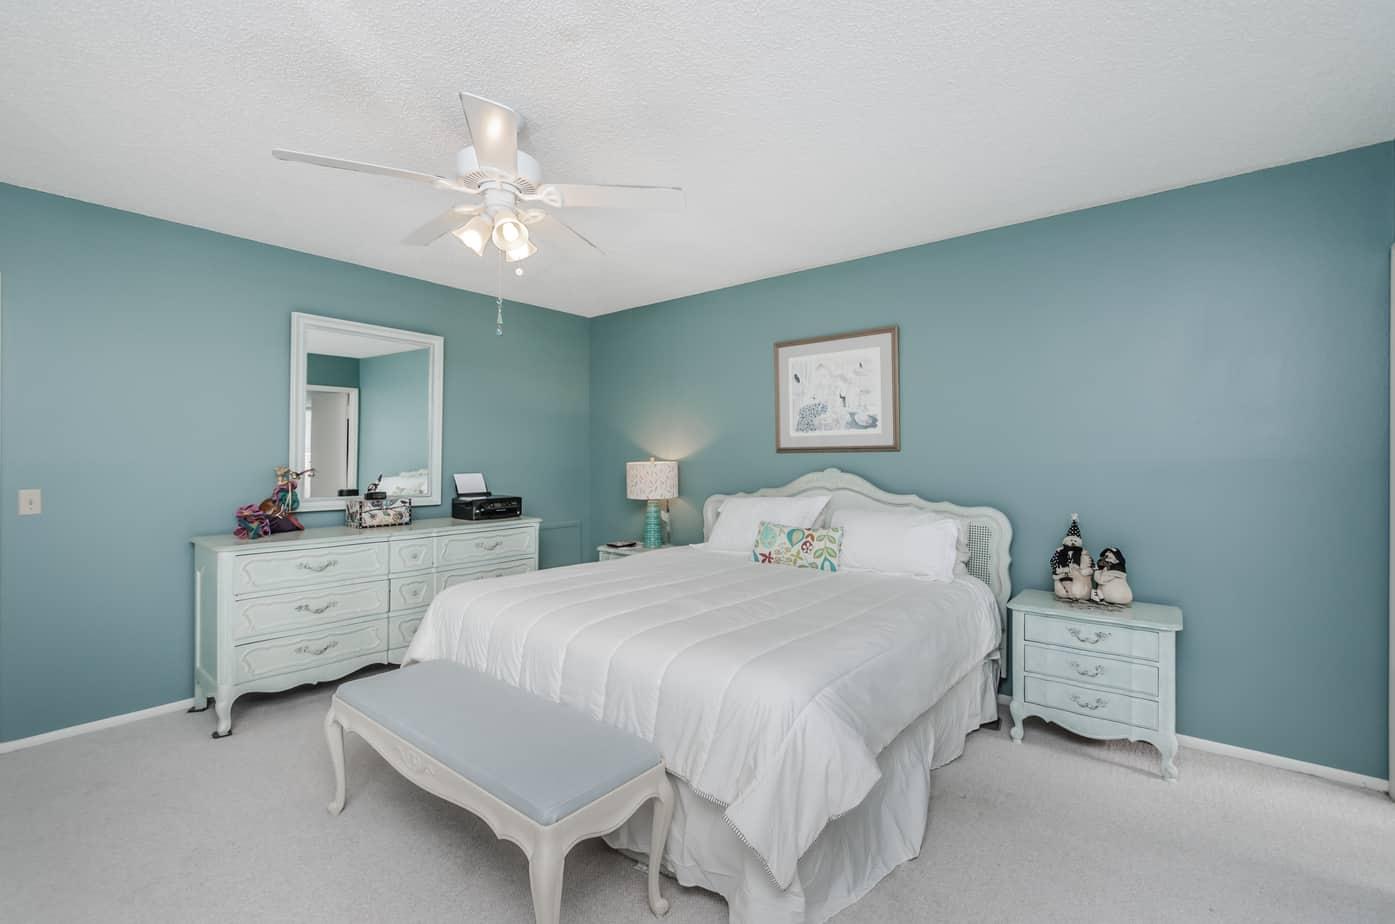 8-2285-Israeli-Dr-#17-Clearwater-Fl-33763-Master Bedroom3